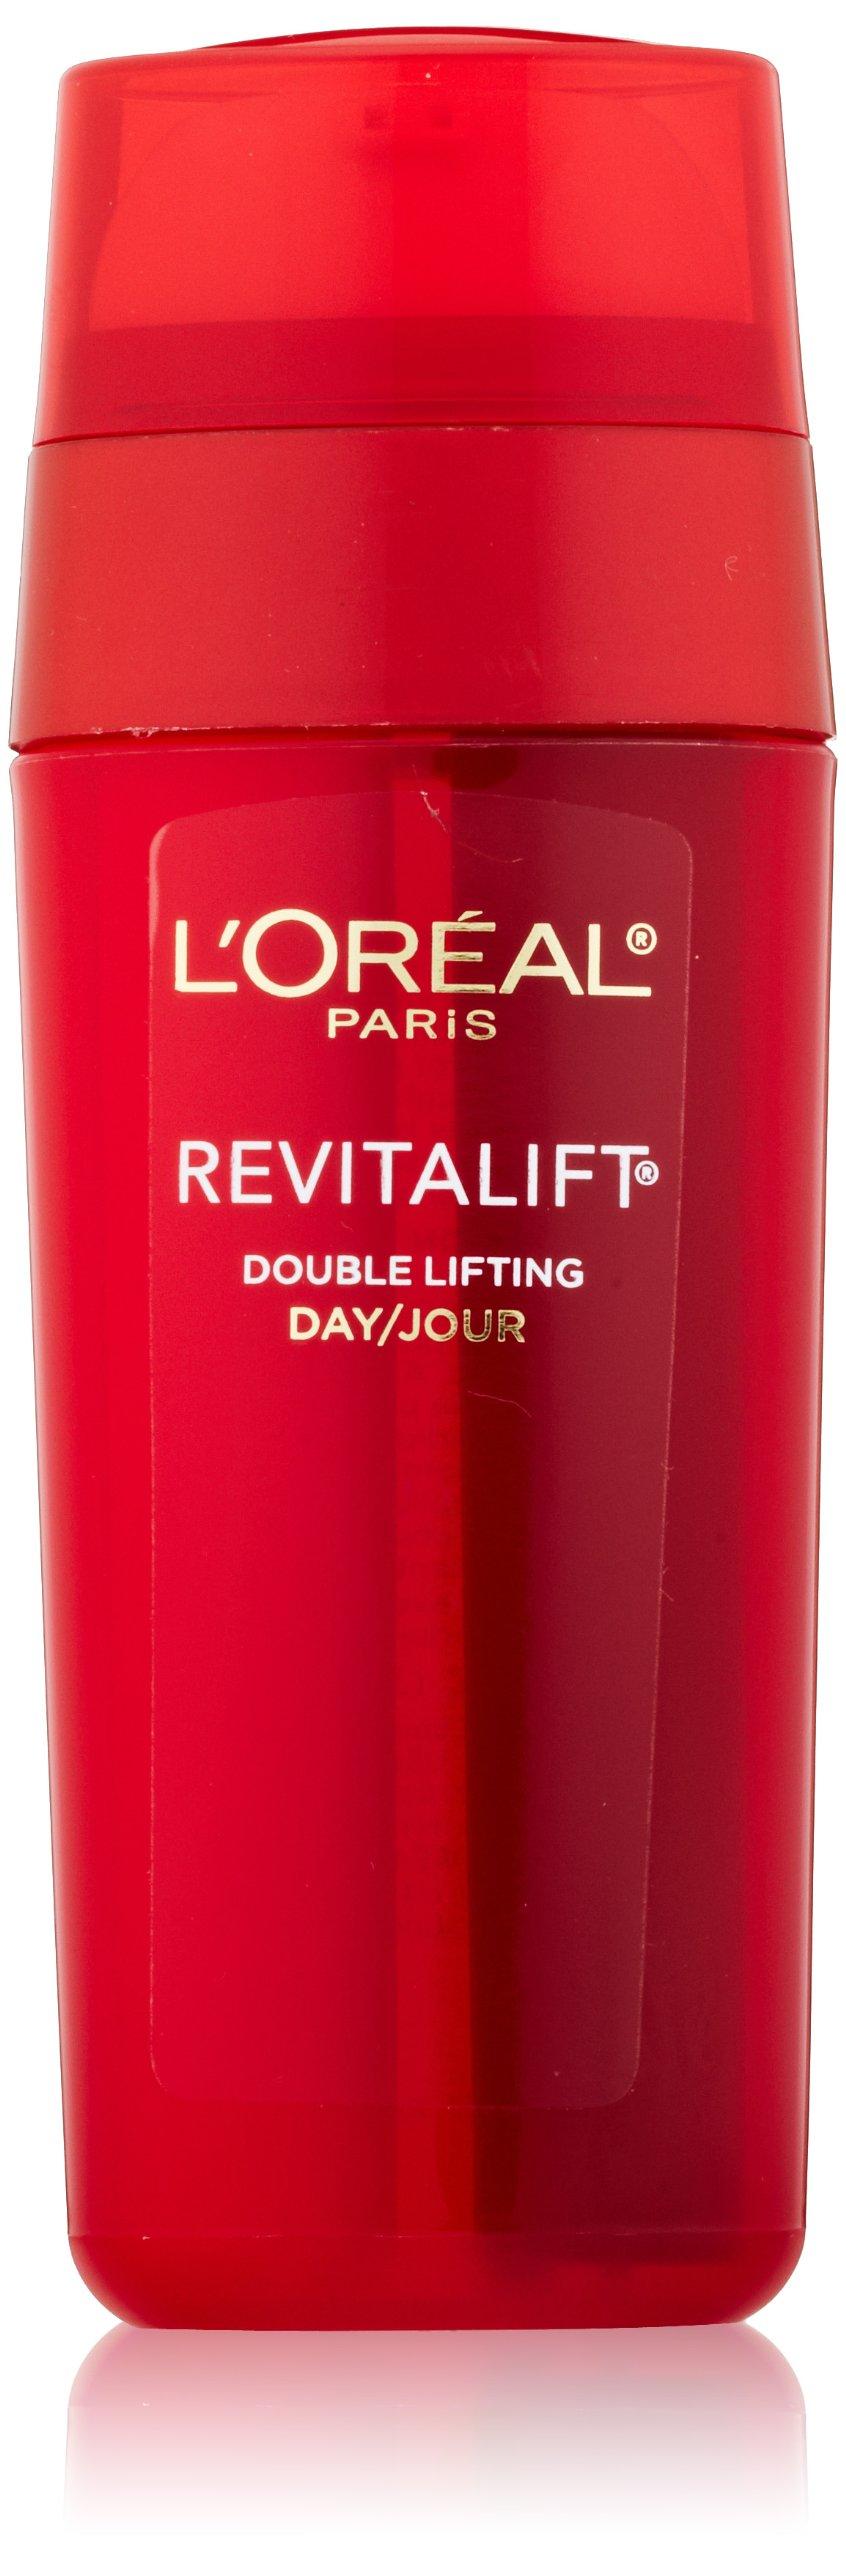 L'Oreal Paris RevitaLift Double Lifting Face Treatment